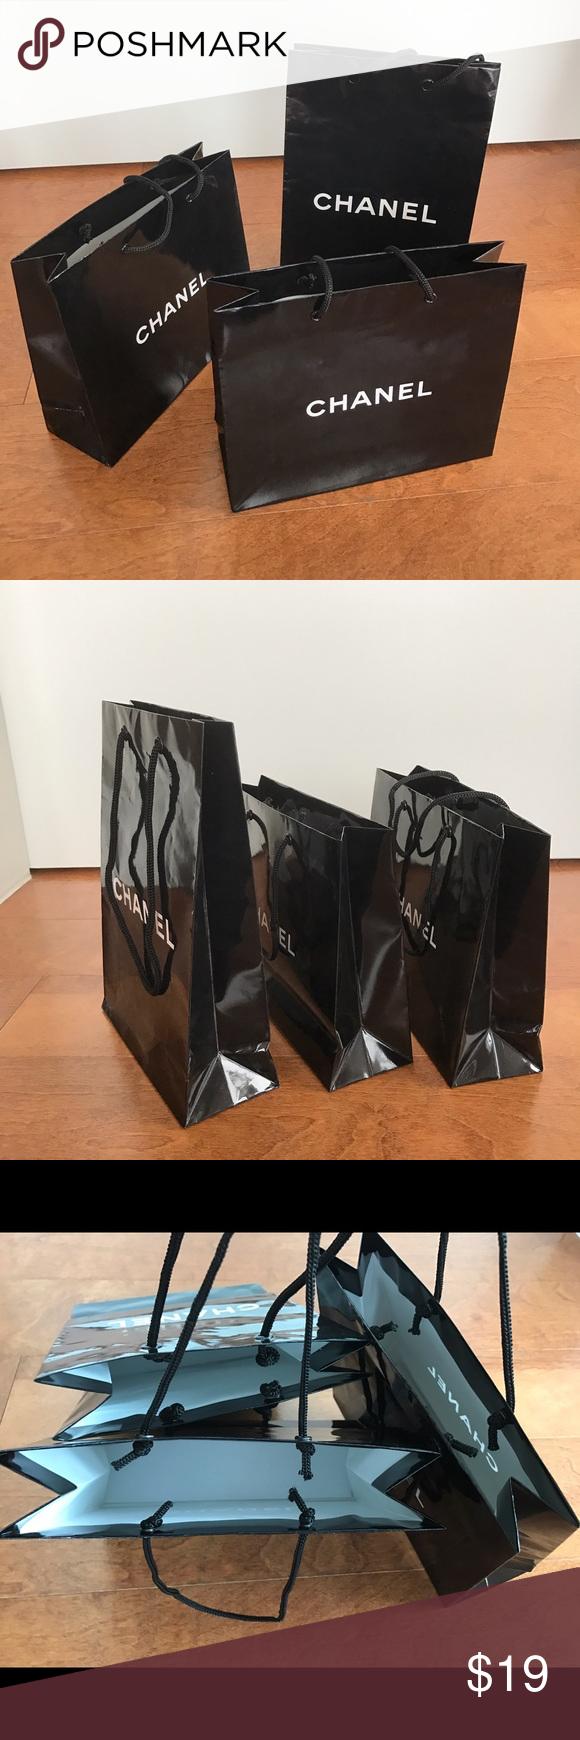 2e5048de2a9c 3 three Chanel black paper bag small size makeup Lot of three small size  Chanel paper